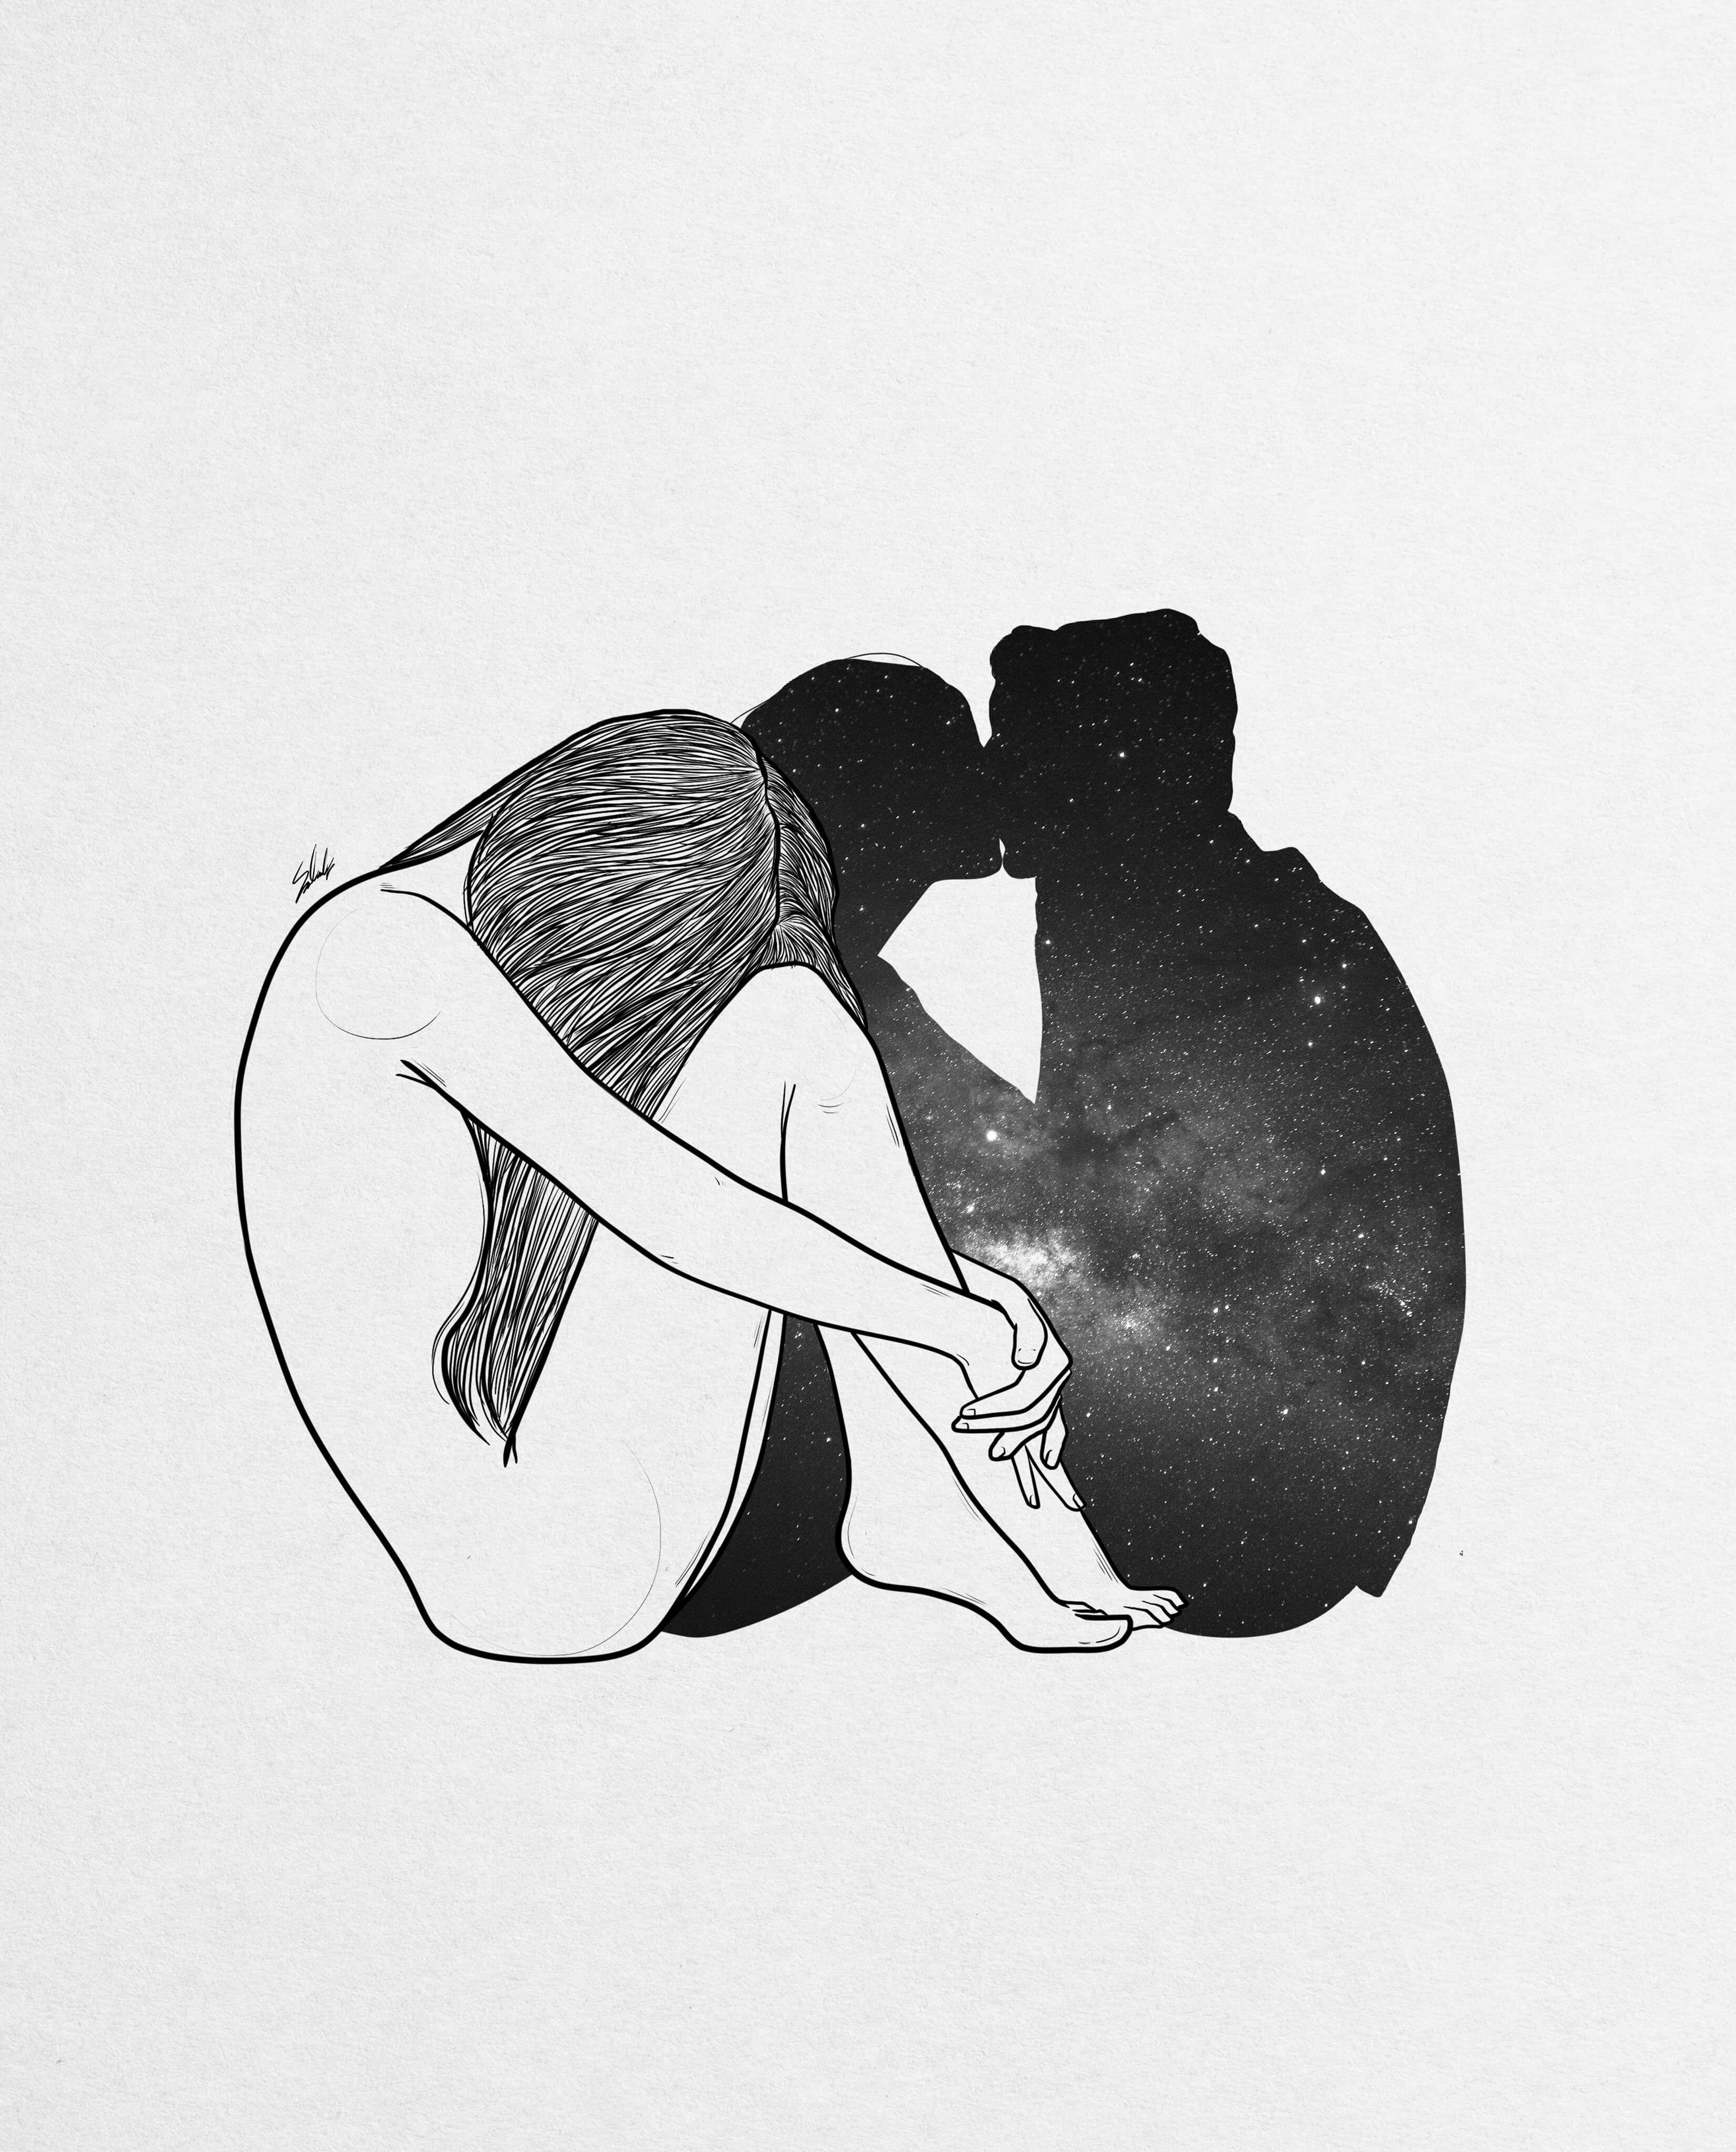 Emotional Deep Drawings : emotional, drawings, Memories, Emotional, Romantic